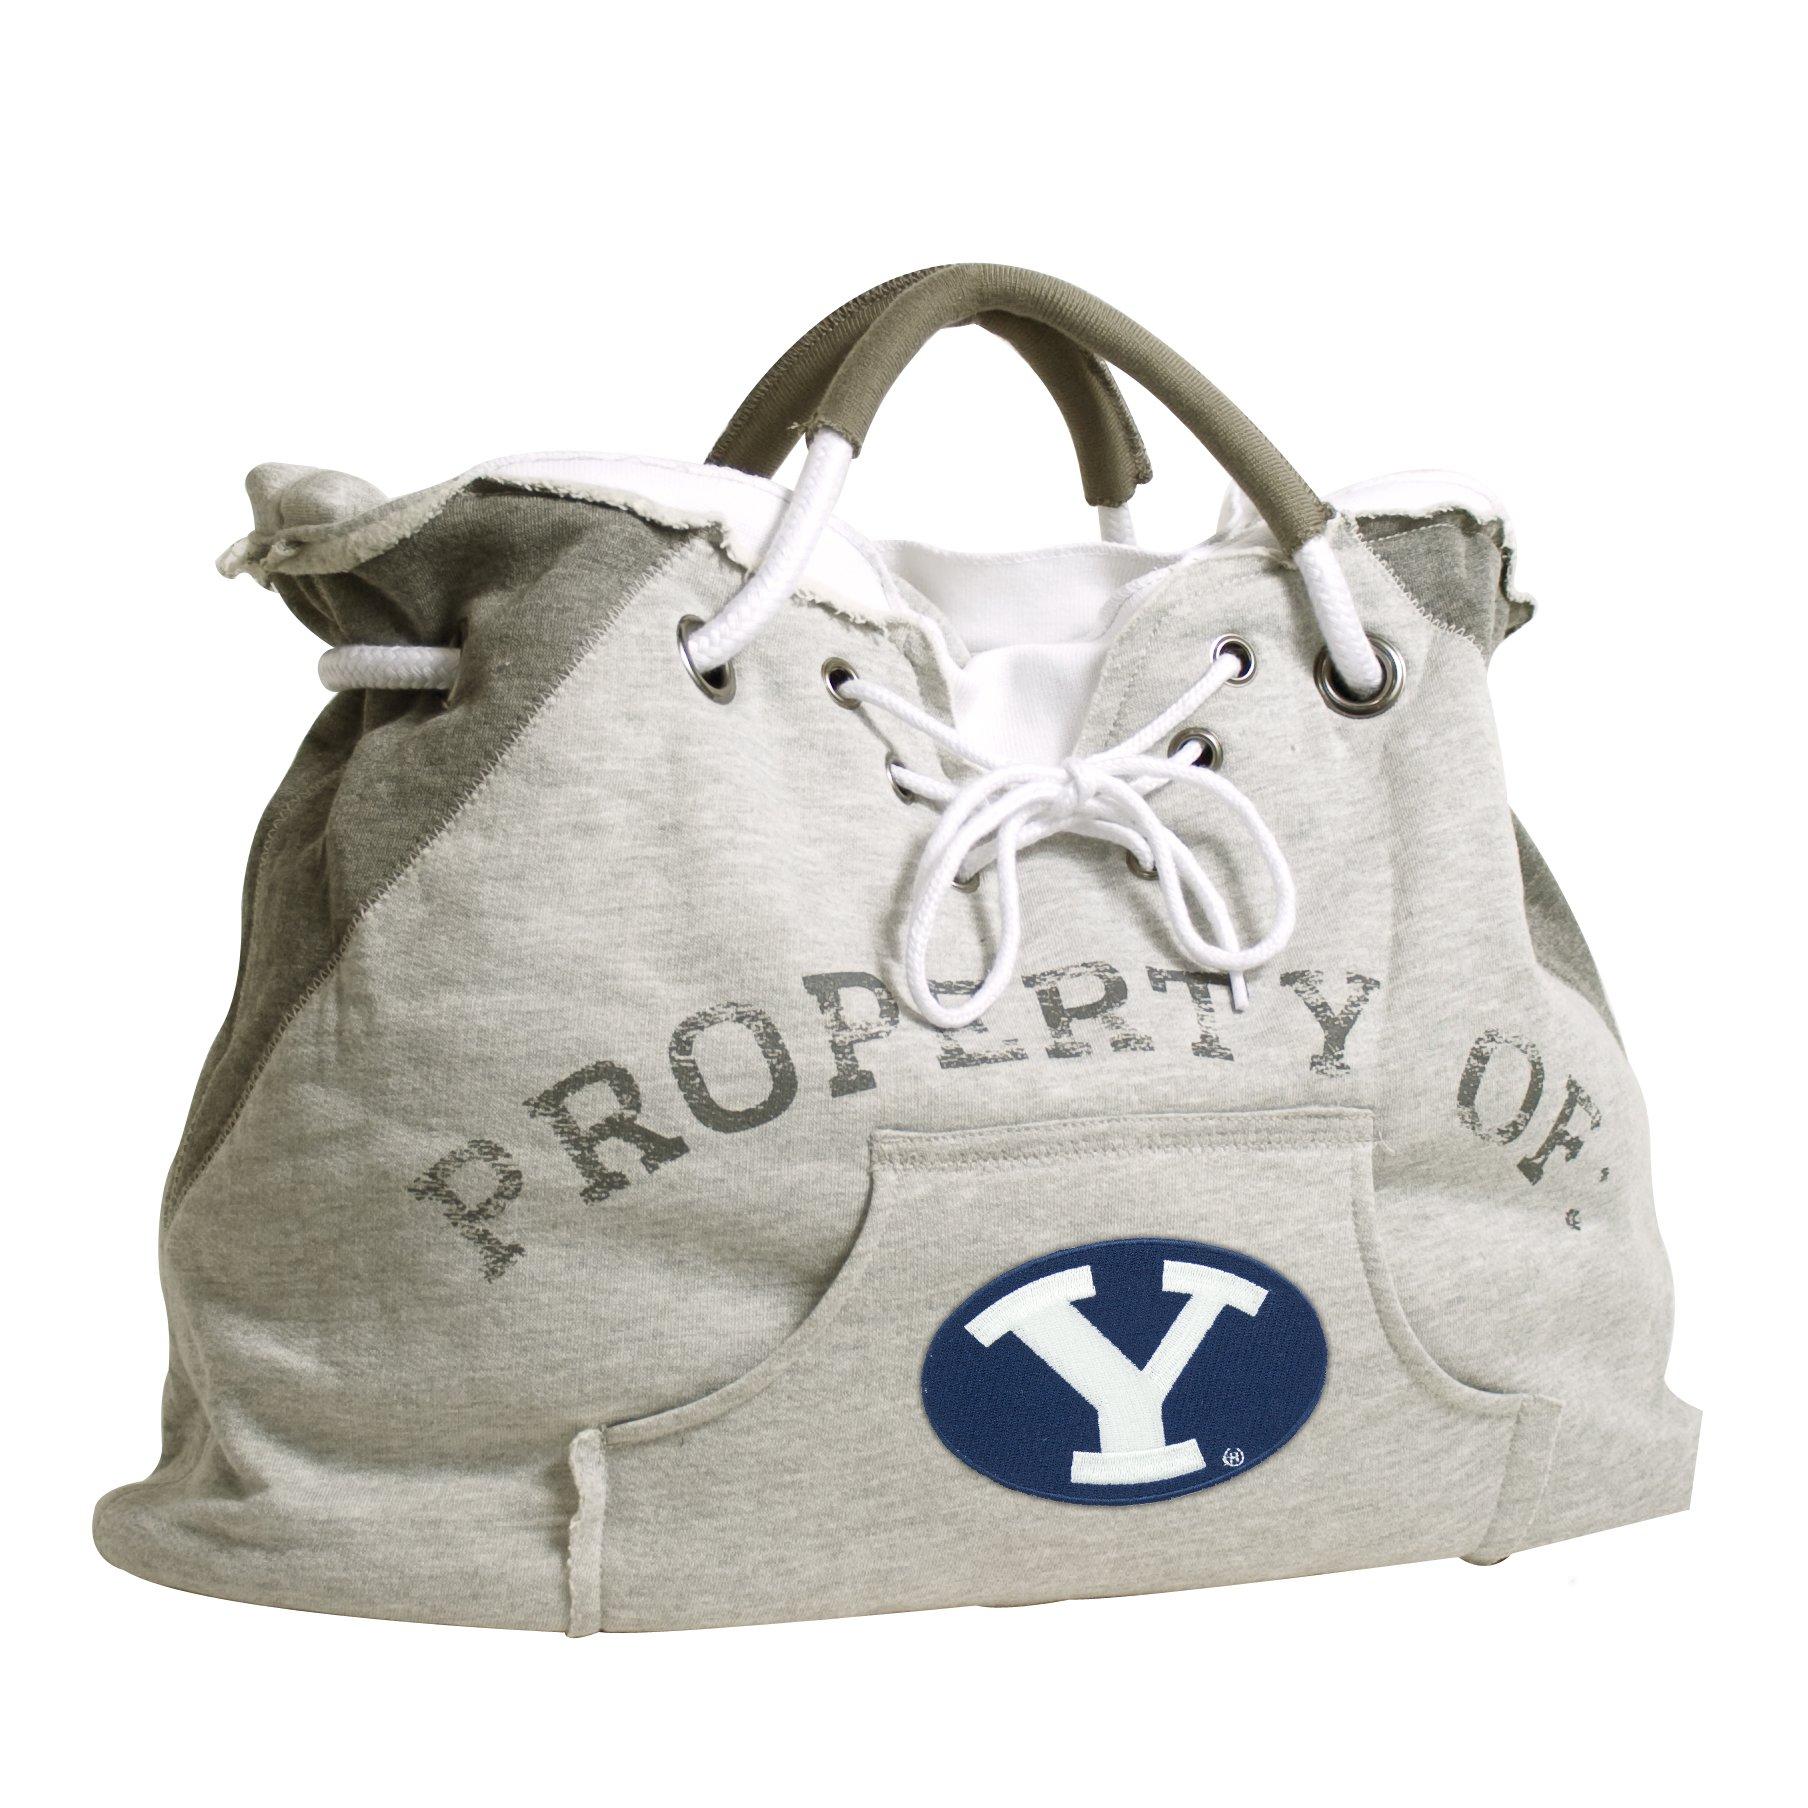 Littlearth NCAA BYU Cougars Hoodie Tote Bag